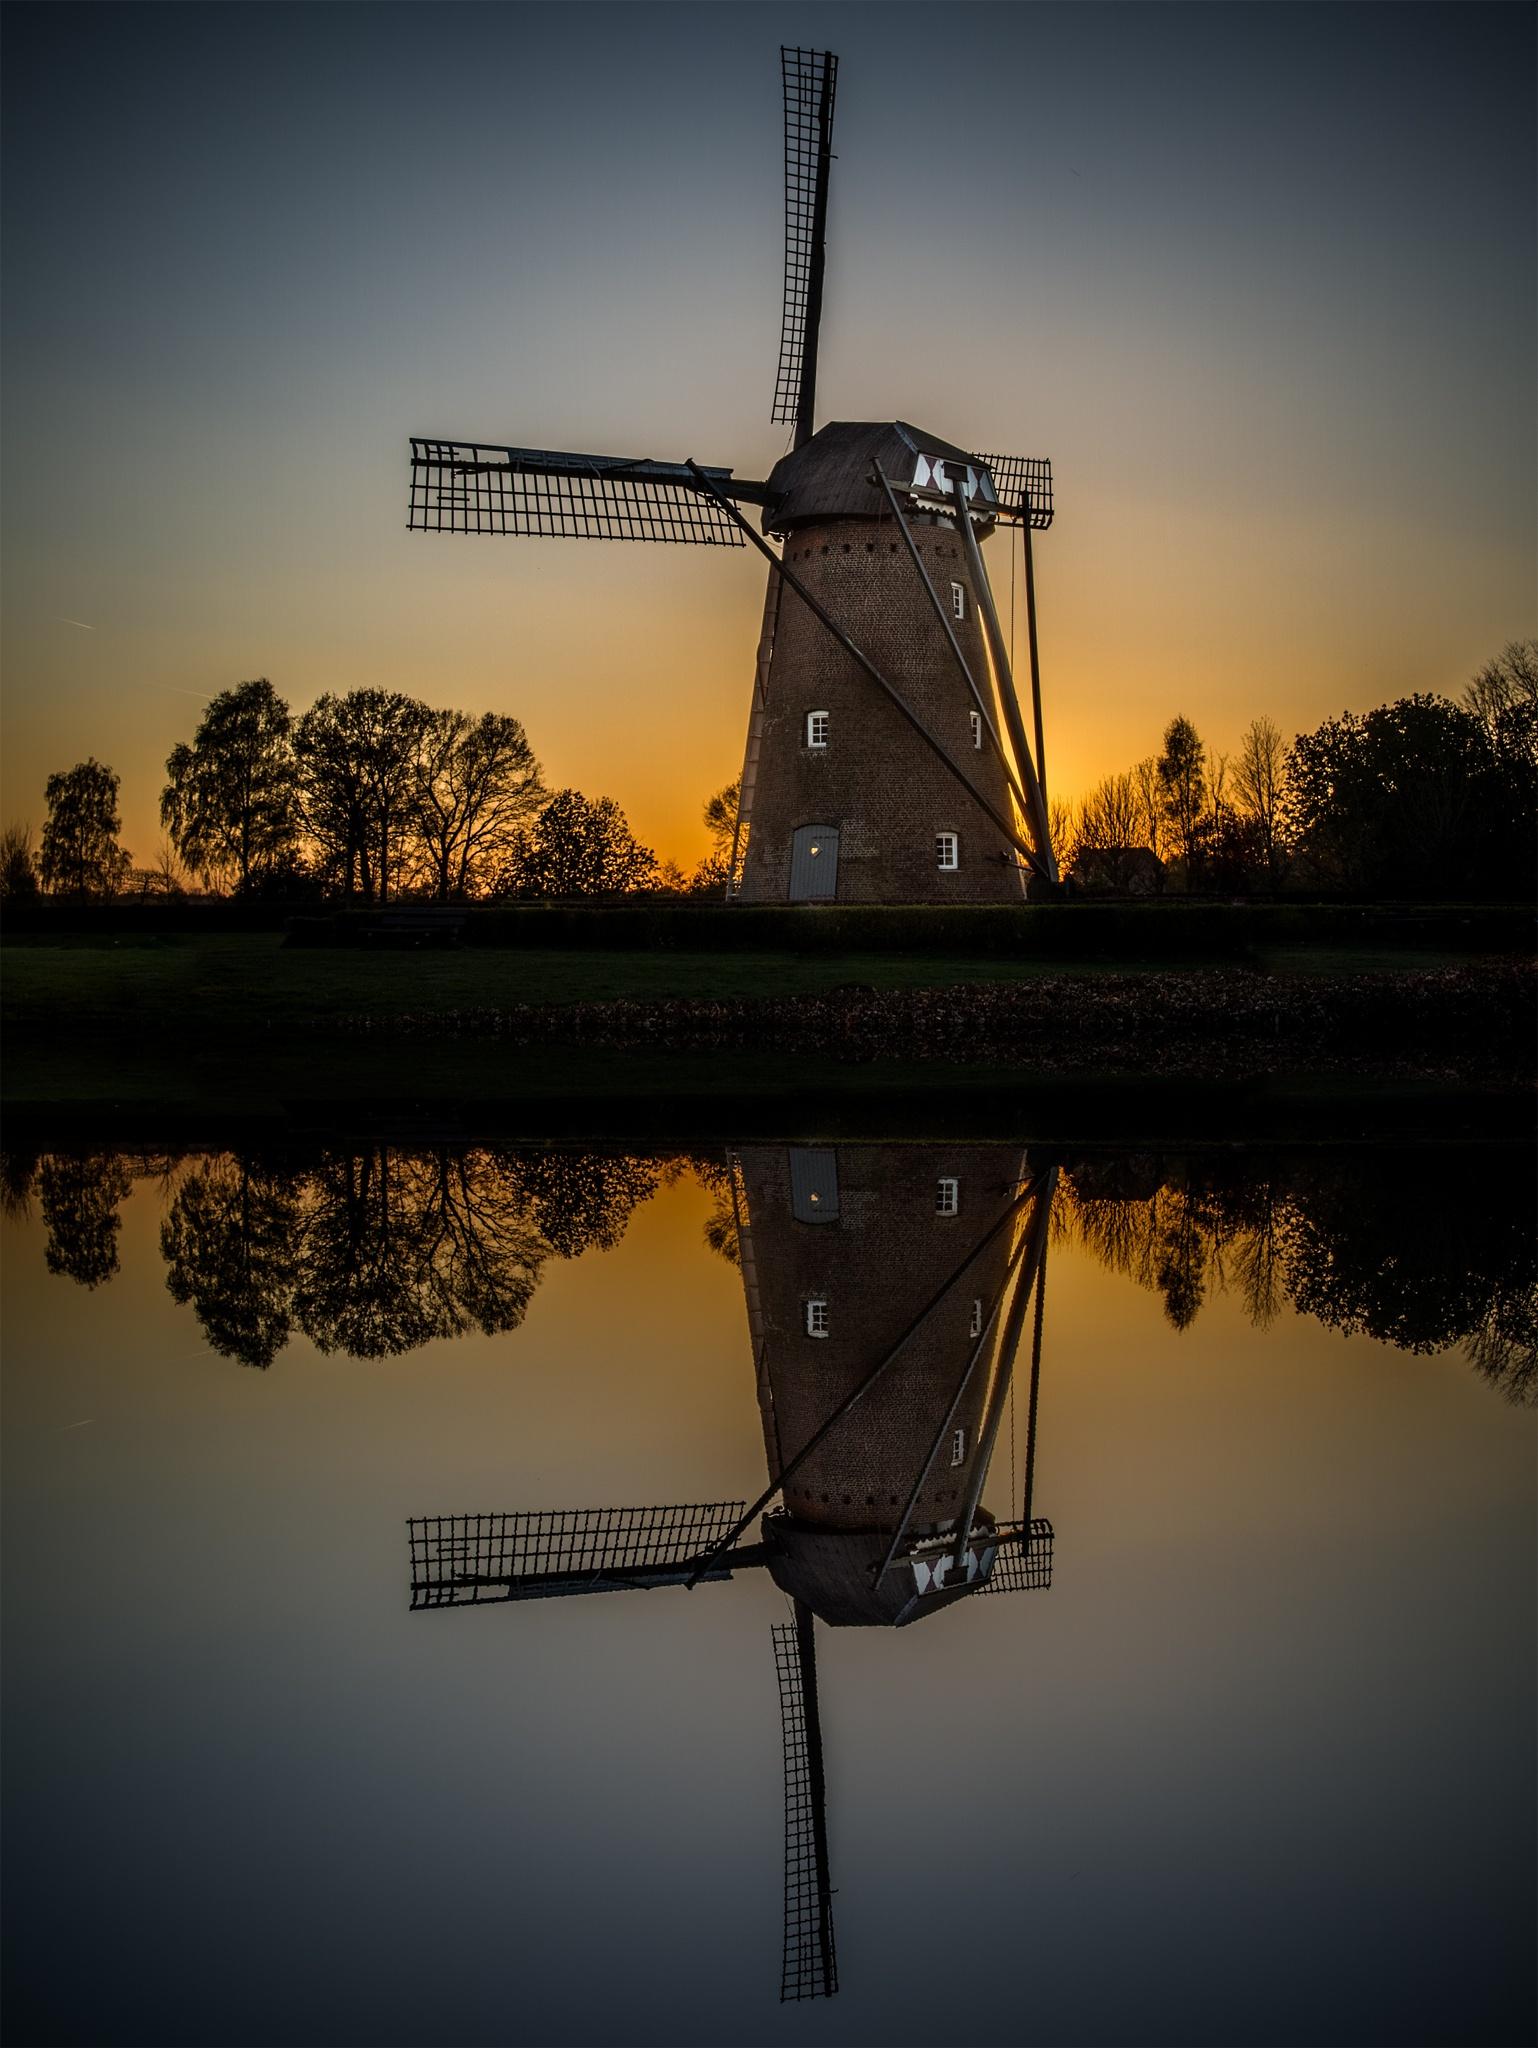 Old mill by sunset by Patrick de Vleeschauwer.